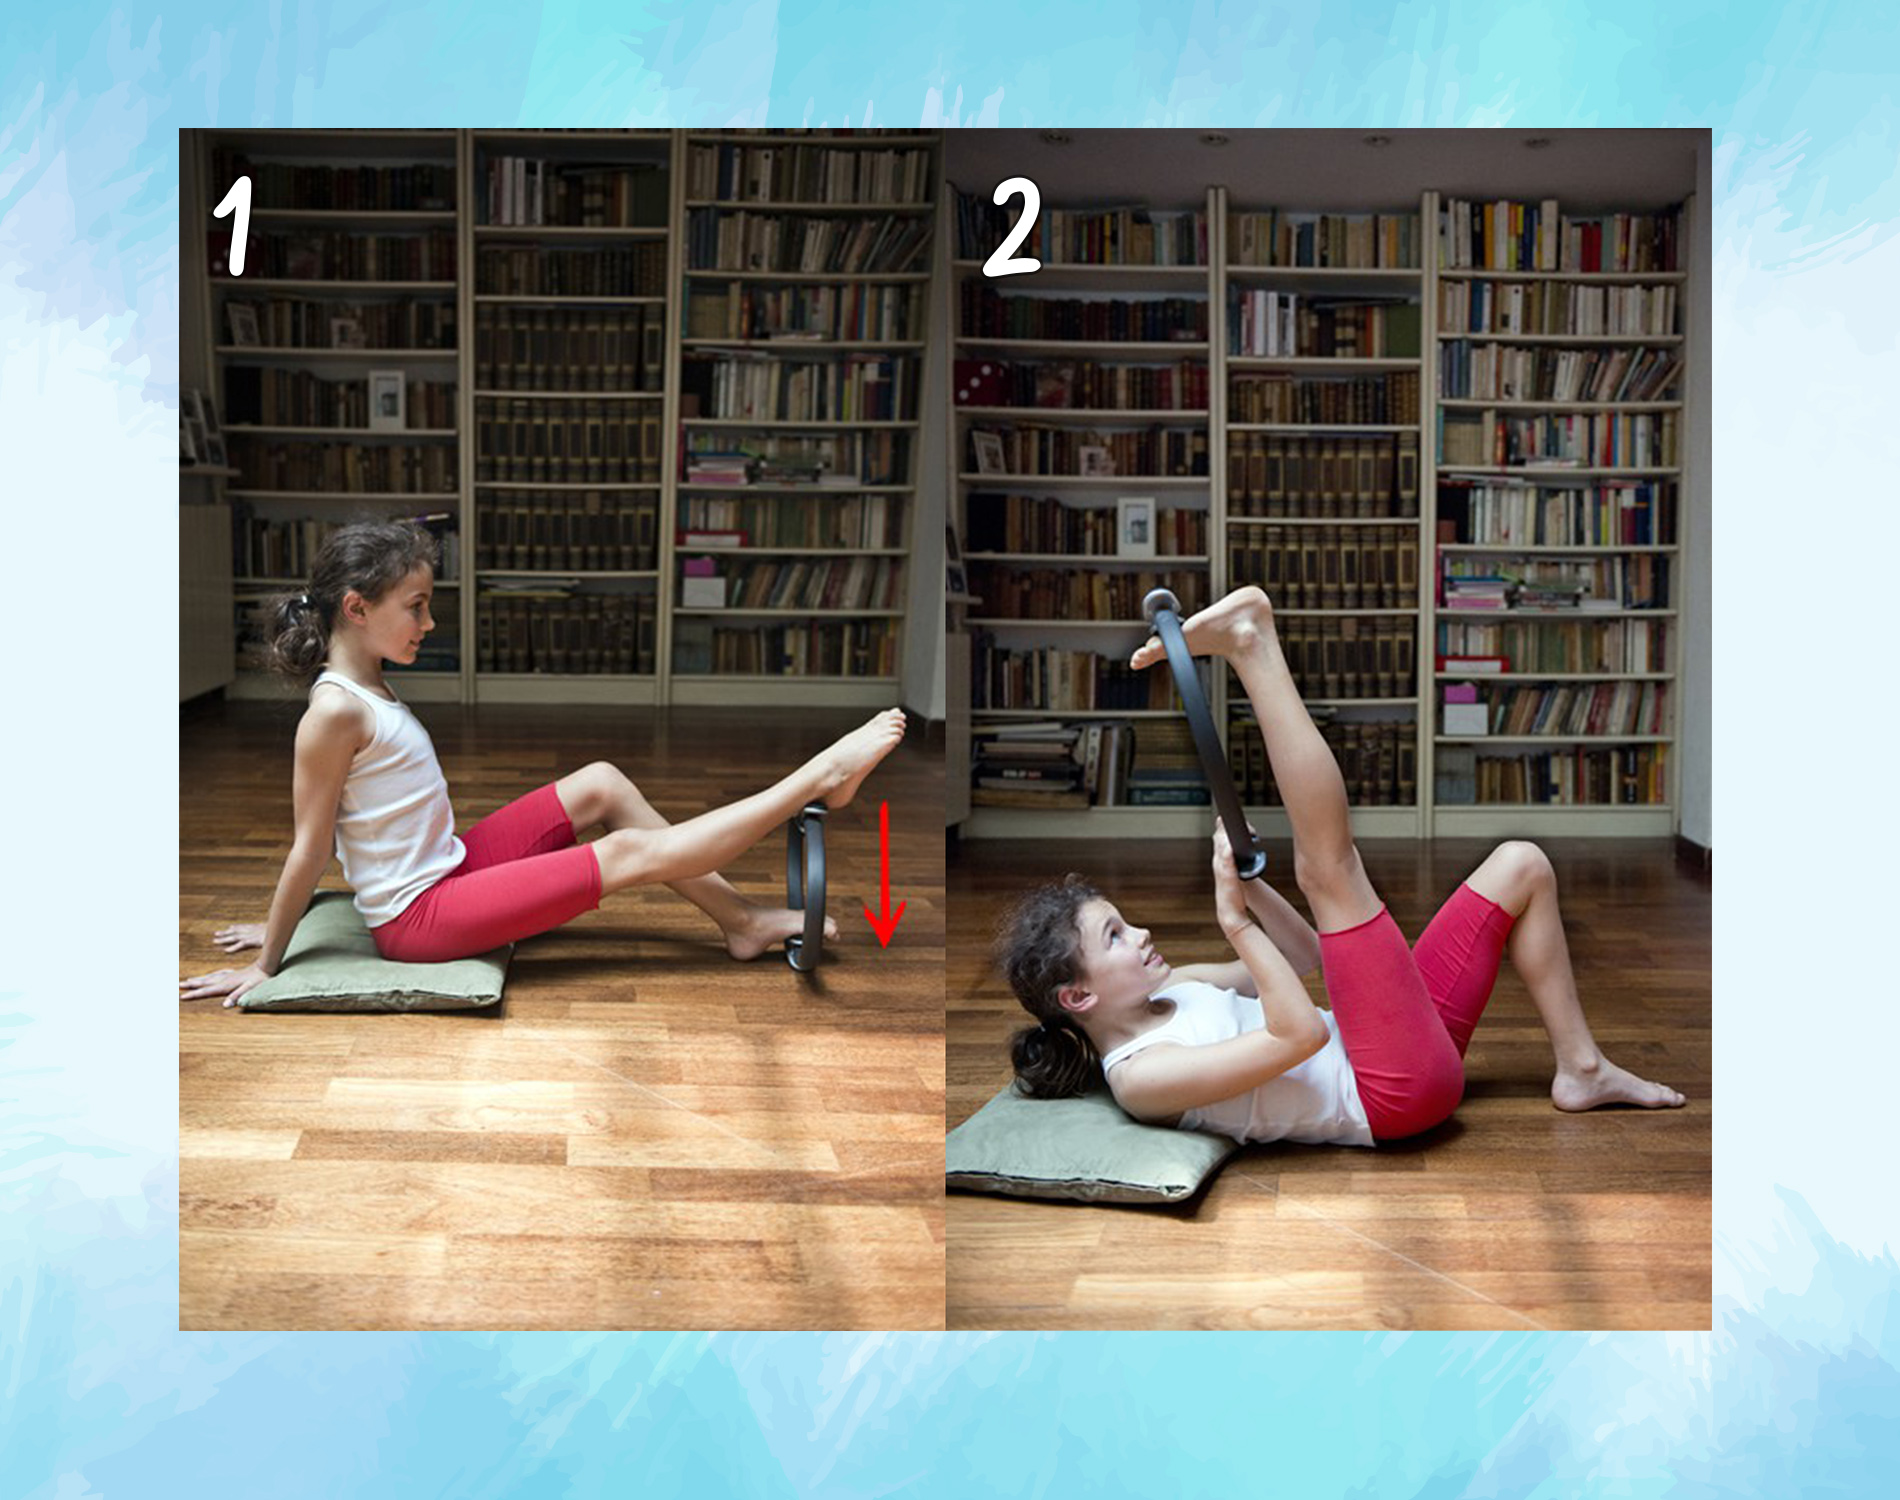 muscoli ischio crurali : ring pilates